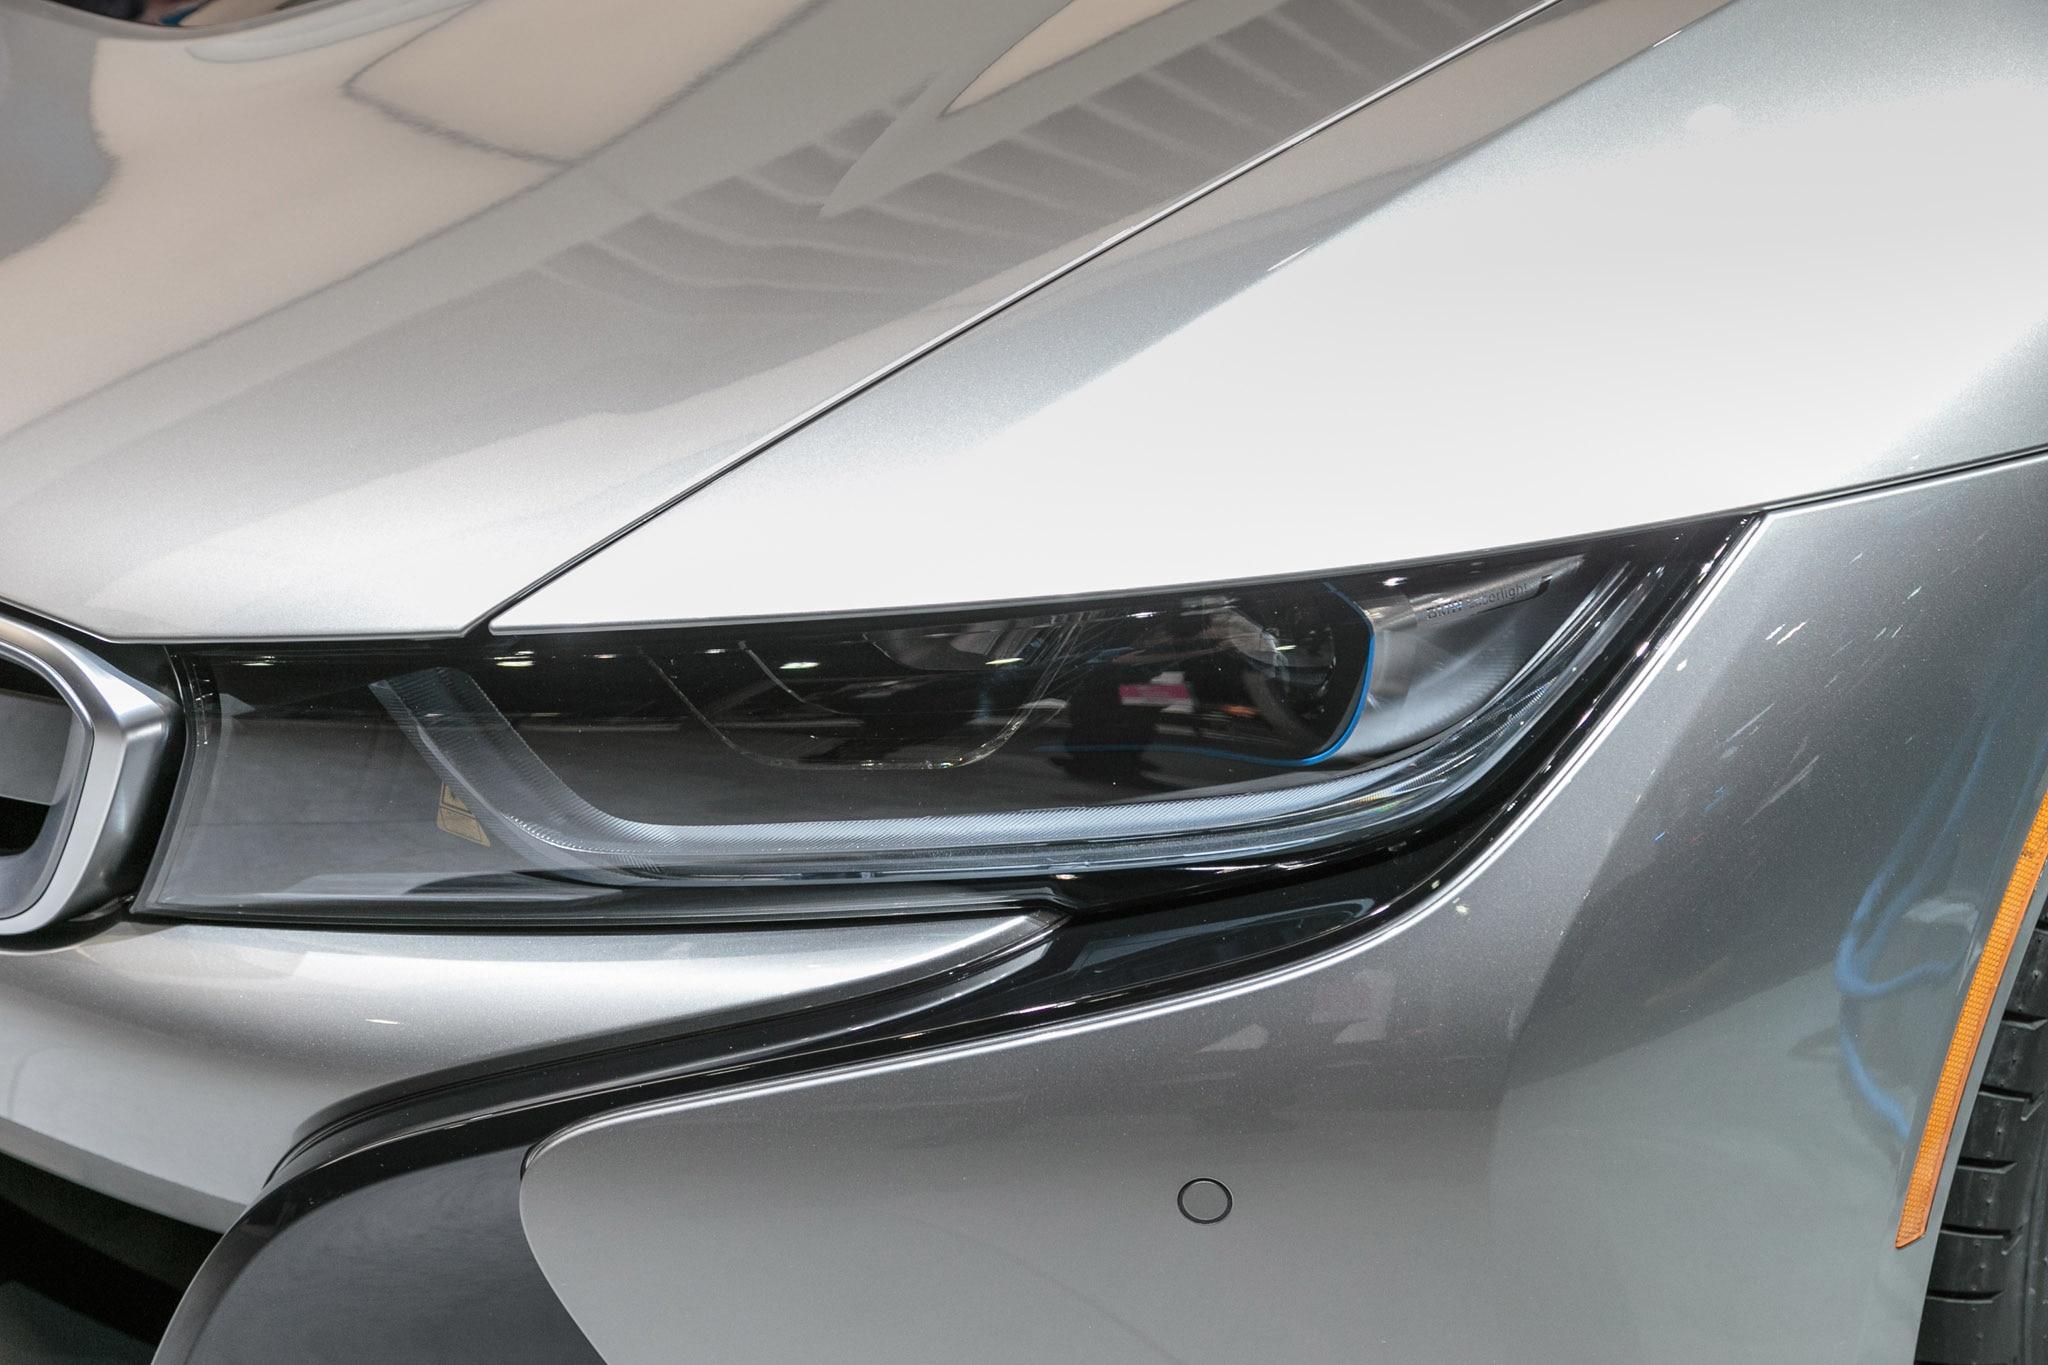 Bmw I8 White And Black New Car Update 2020